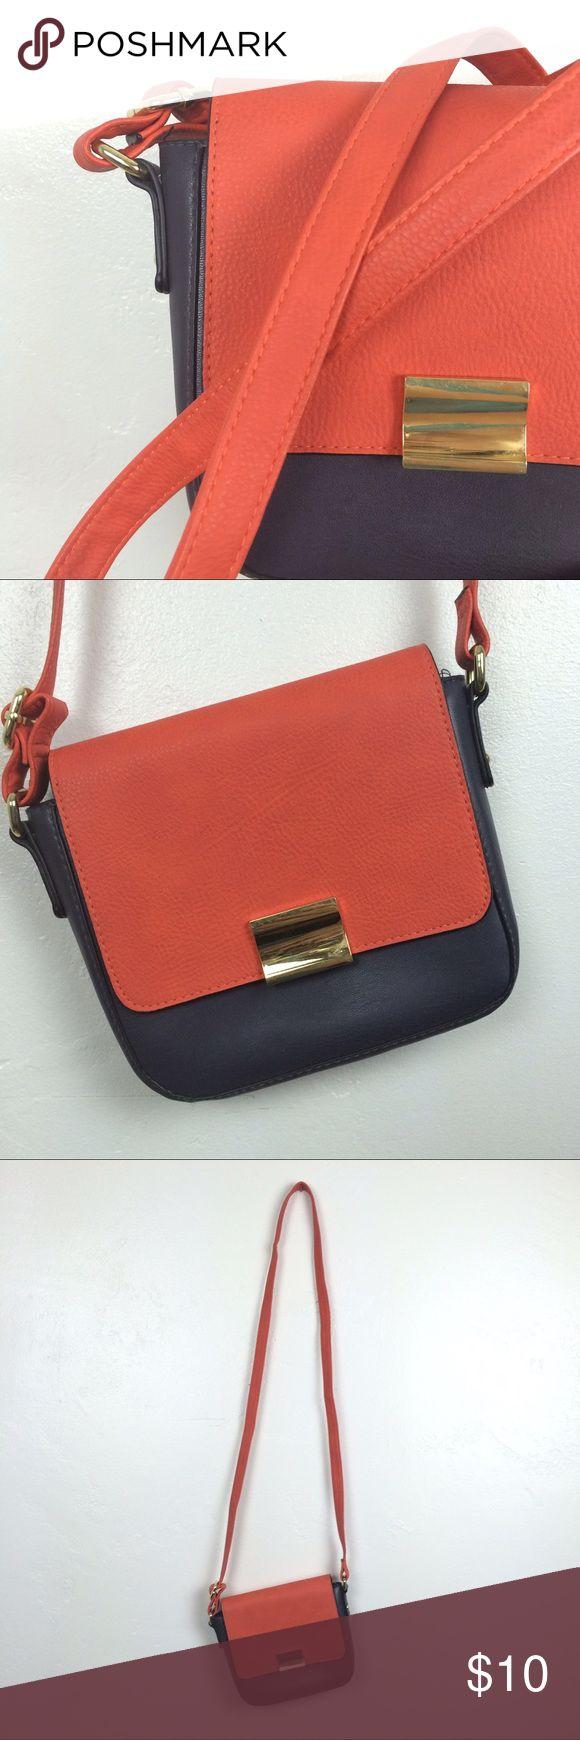 Target Merona red and dark grey shoulder bag Small messenger/ shoulder bag bright red/orange and dark grey with gold color buckle. Merona Bags Shoulder Bags